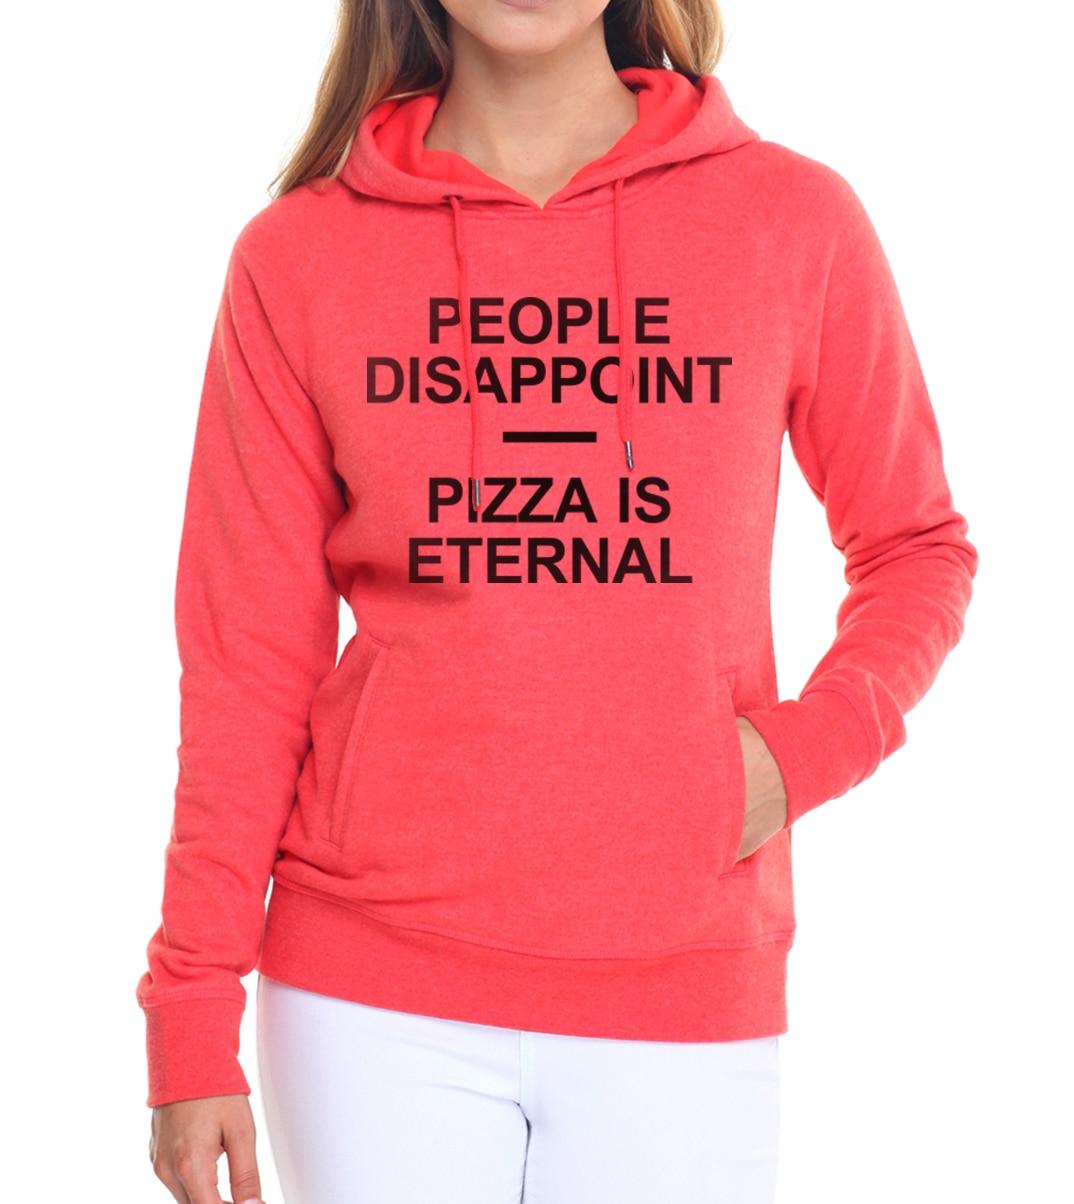 hoody kpop pullovers PEOPLE DISAPPOINT PIZZA ETERNAL tracksuits women Casual fleece pink hoodies femme brand harajuku sweatshirt